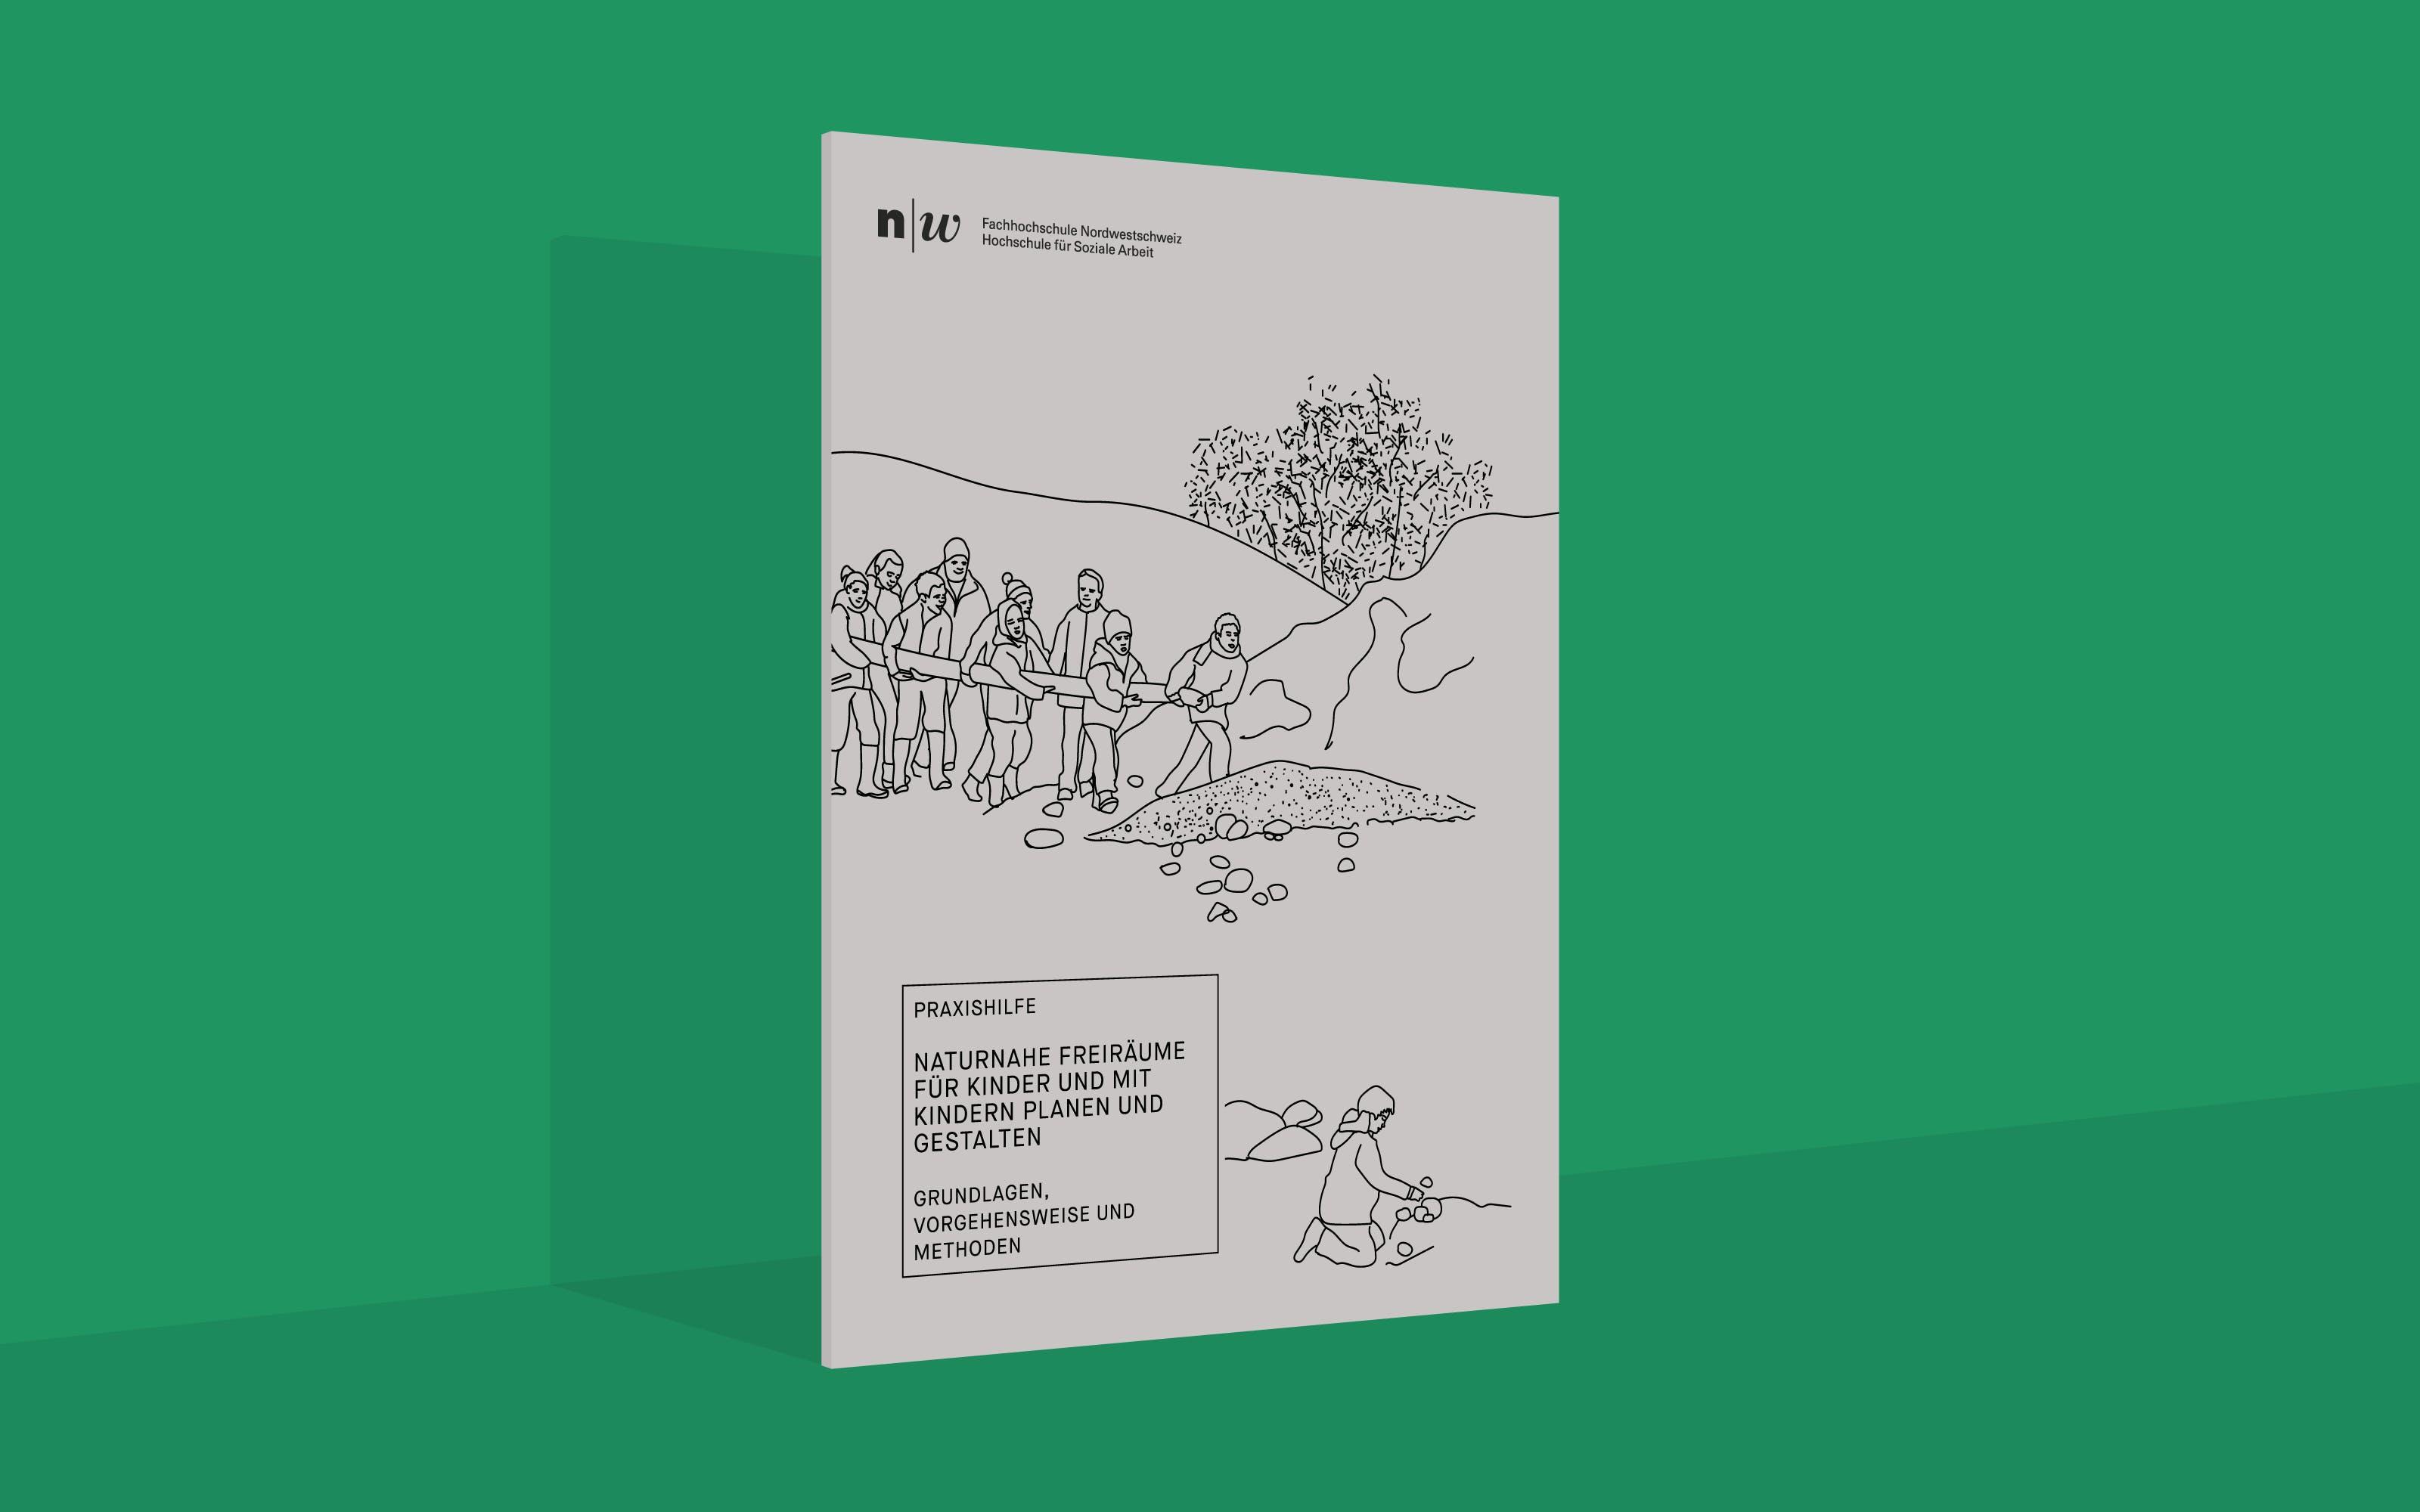 Superdot Studio Illustrated Science Methodologies in a Playful Book for FHNW Hochschule für soziale Arbeit (School of Social Work), 2016